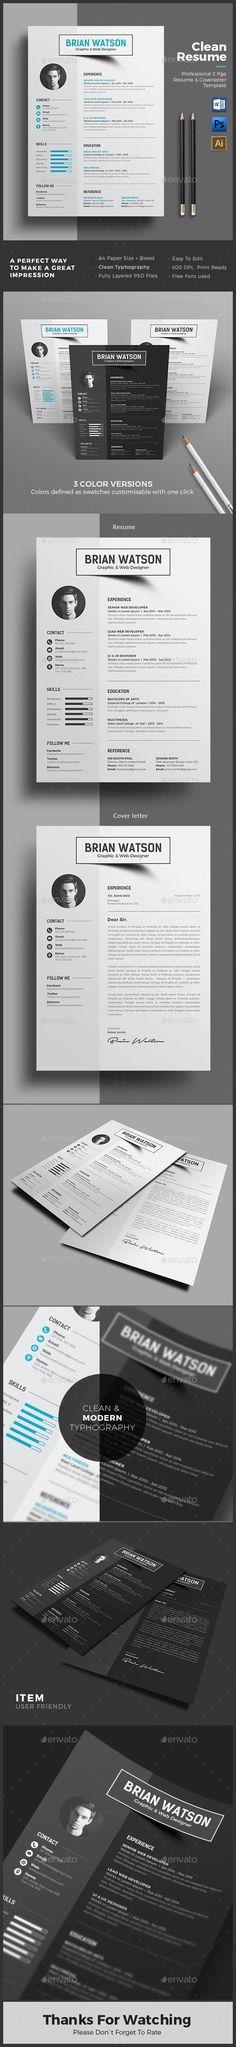 Free-Creative-Resume-Template-in-PSD-Format u2026 Pinteresu2026 - resume template psd